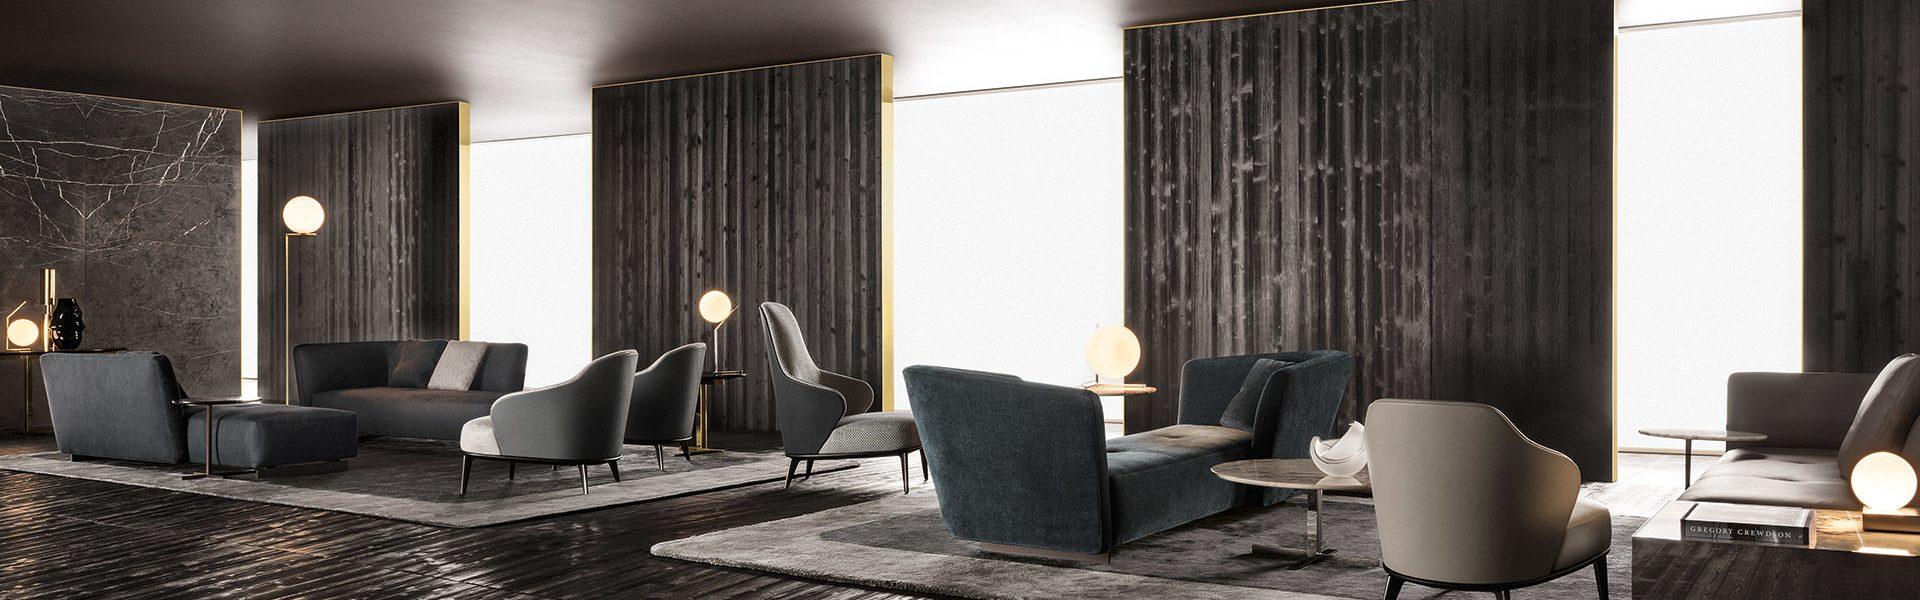 Lounge Seymour Sofa